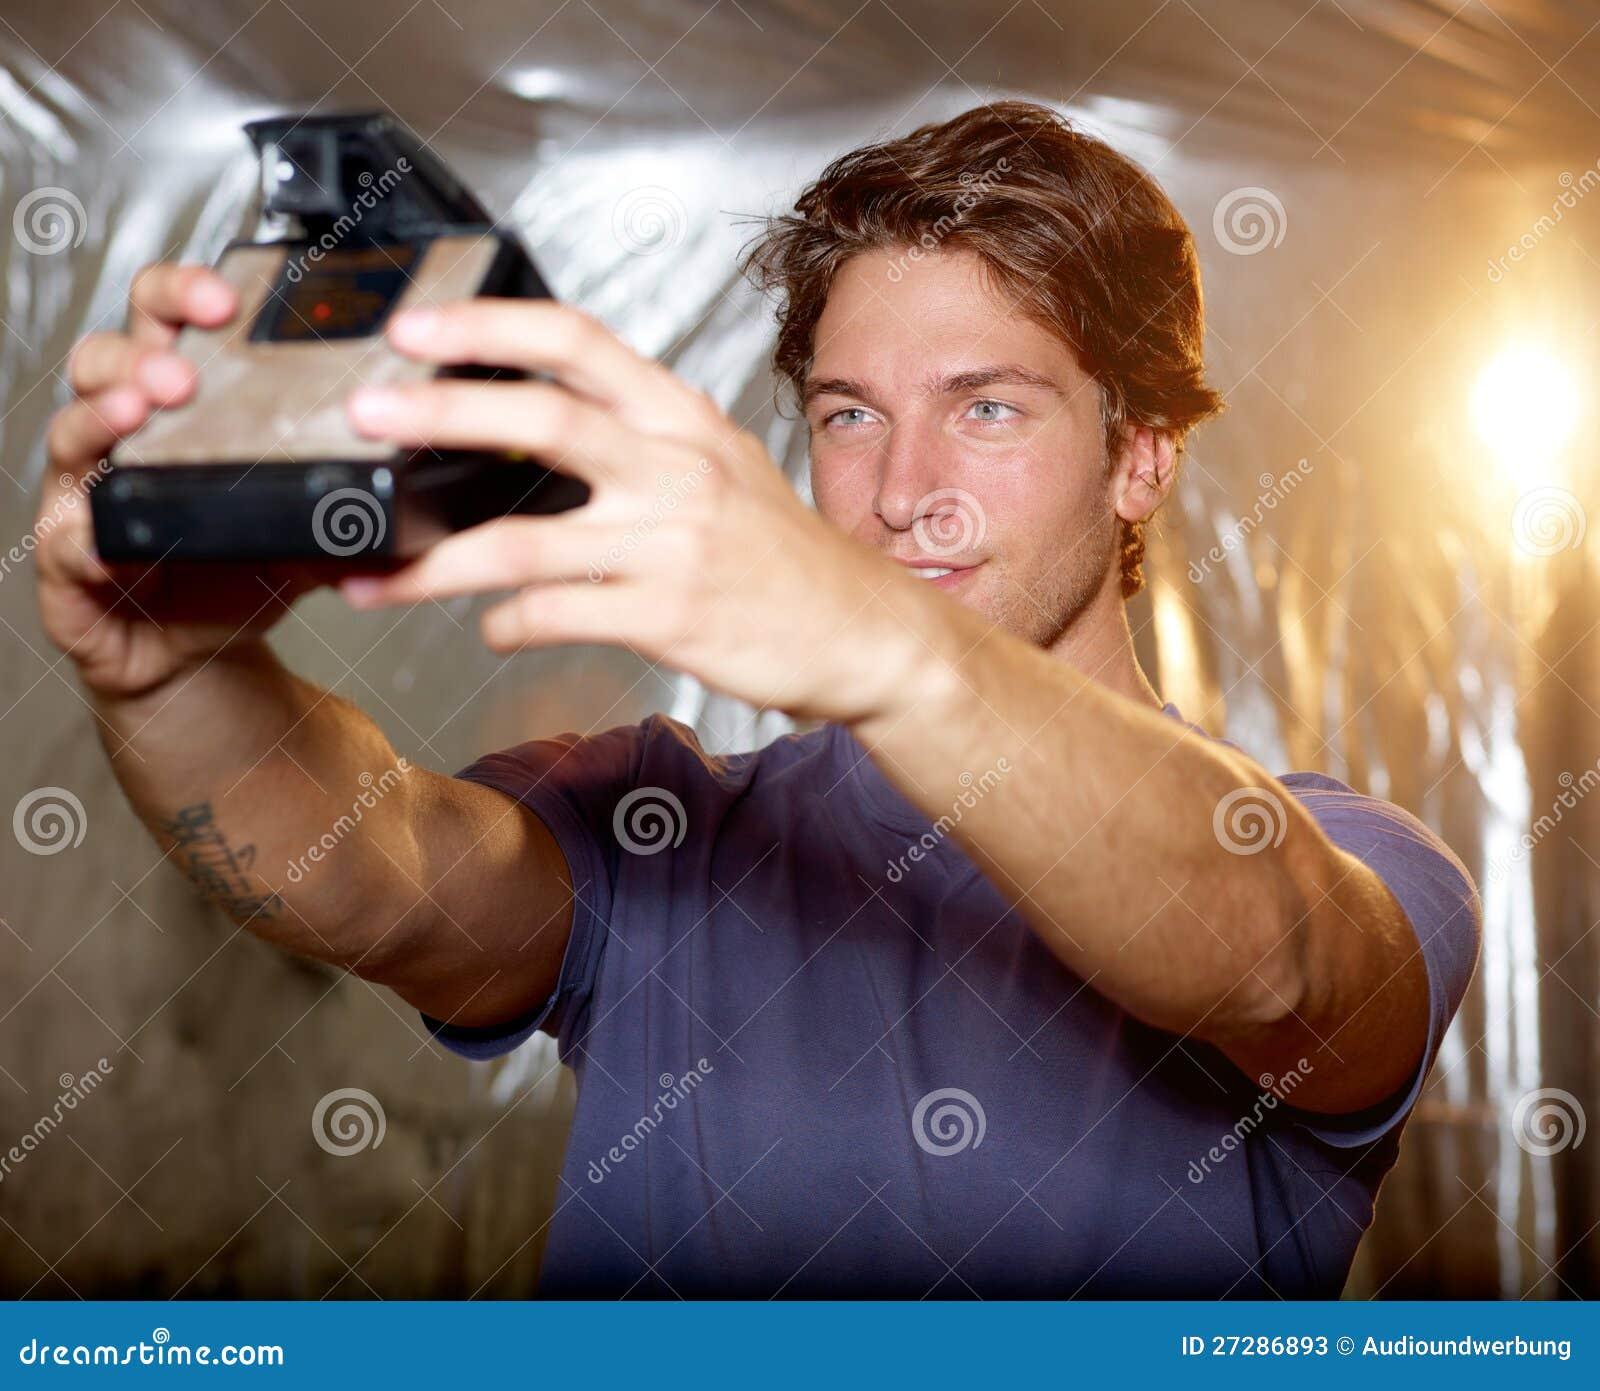 Selfportraitkort